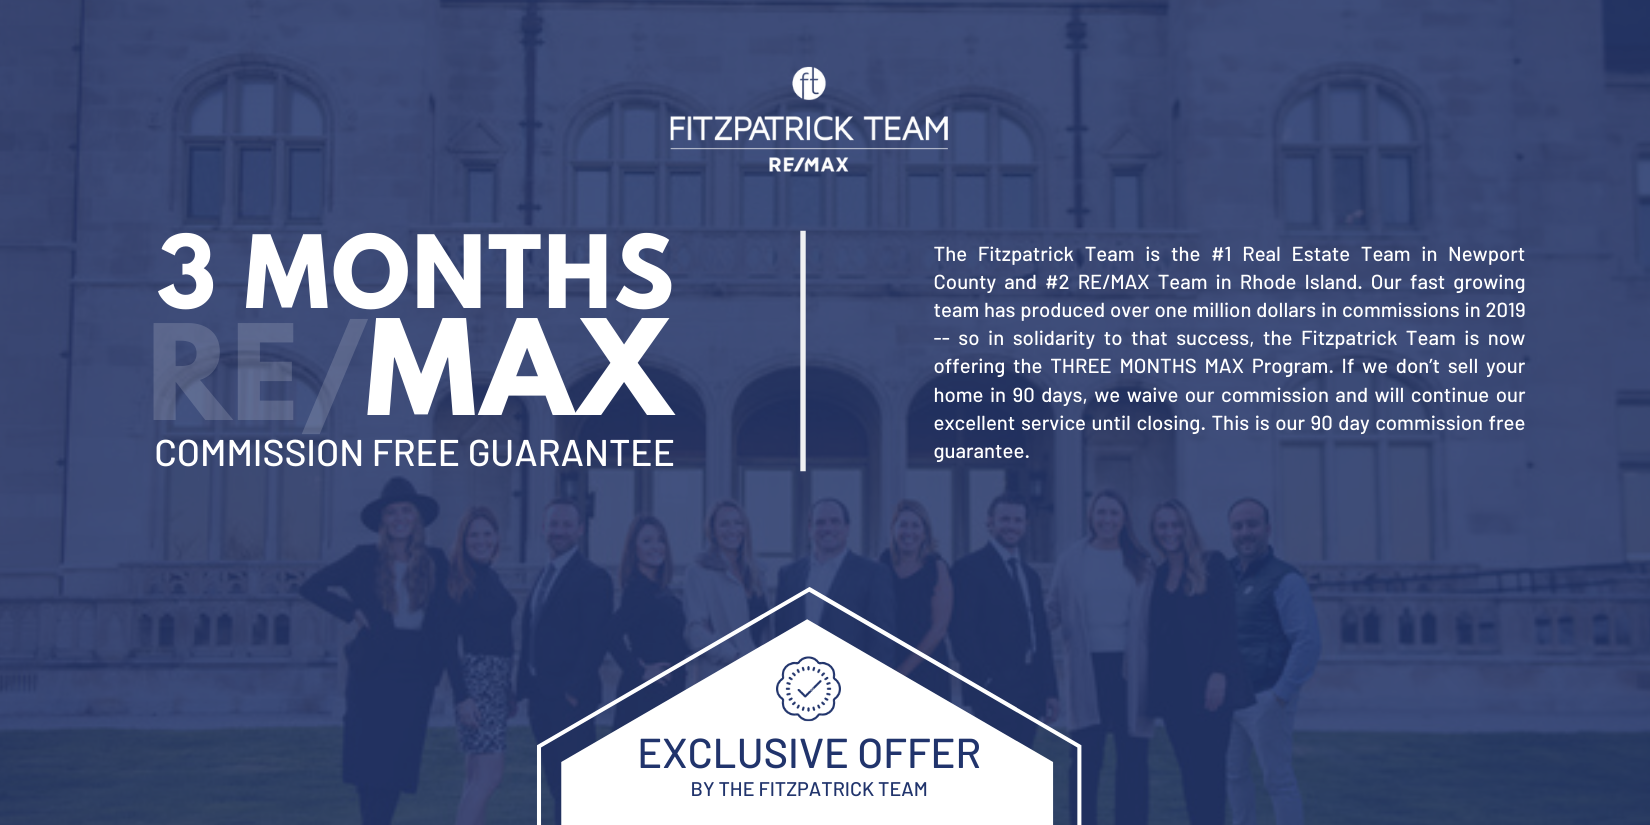 Fitzpatrick Team Re/Max